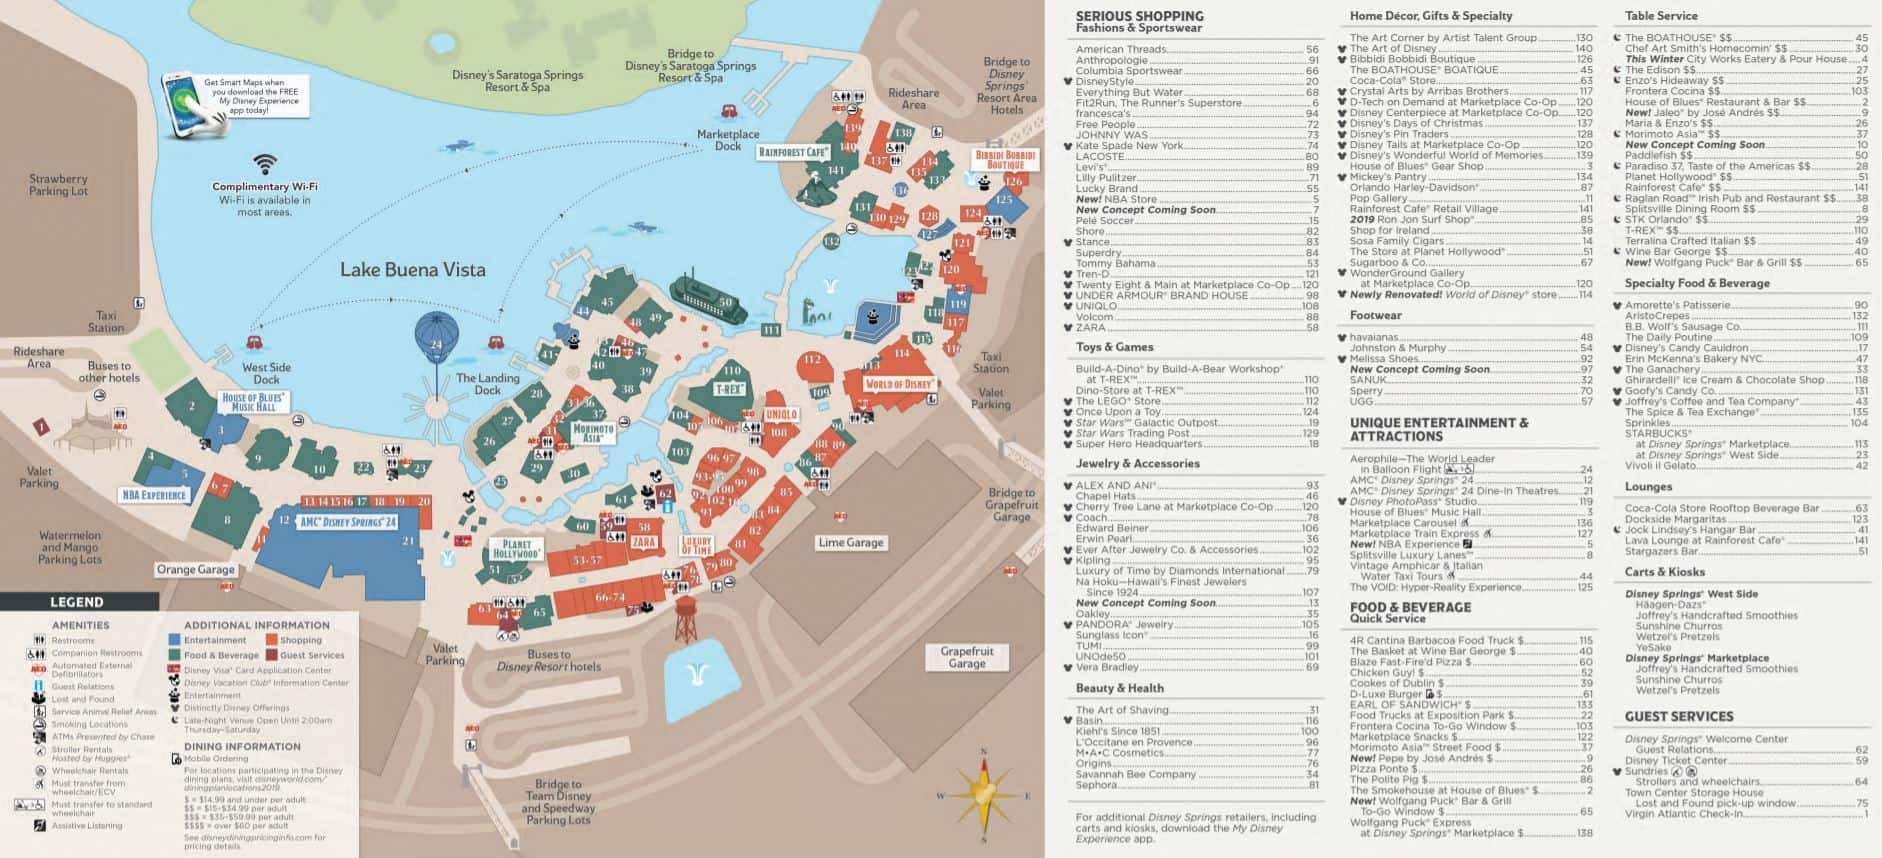 Disney Springs Map